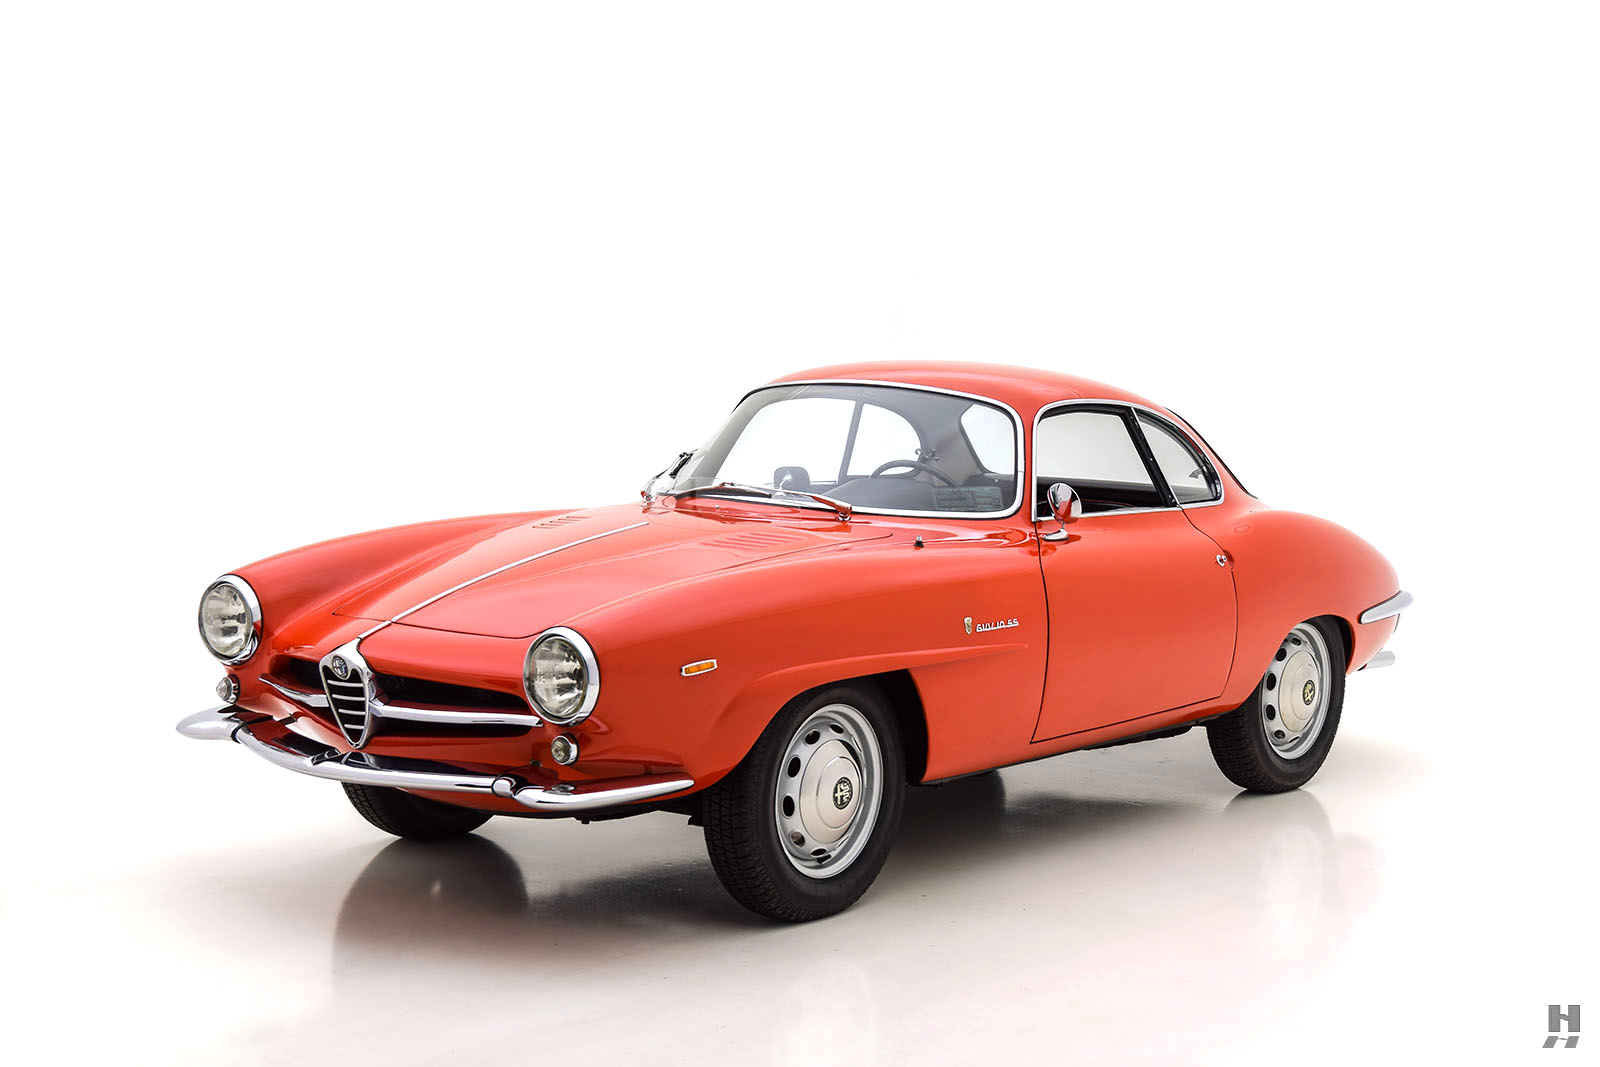 1964 Alfa Romeo Giulia Sprint Speciale Coupe For Sale at Hyman LTD